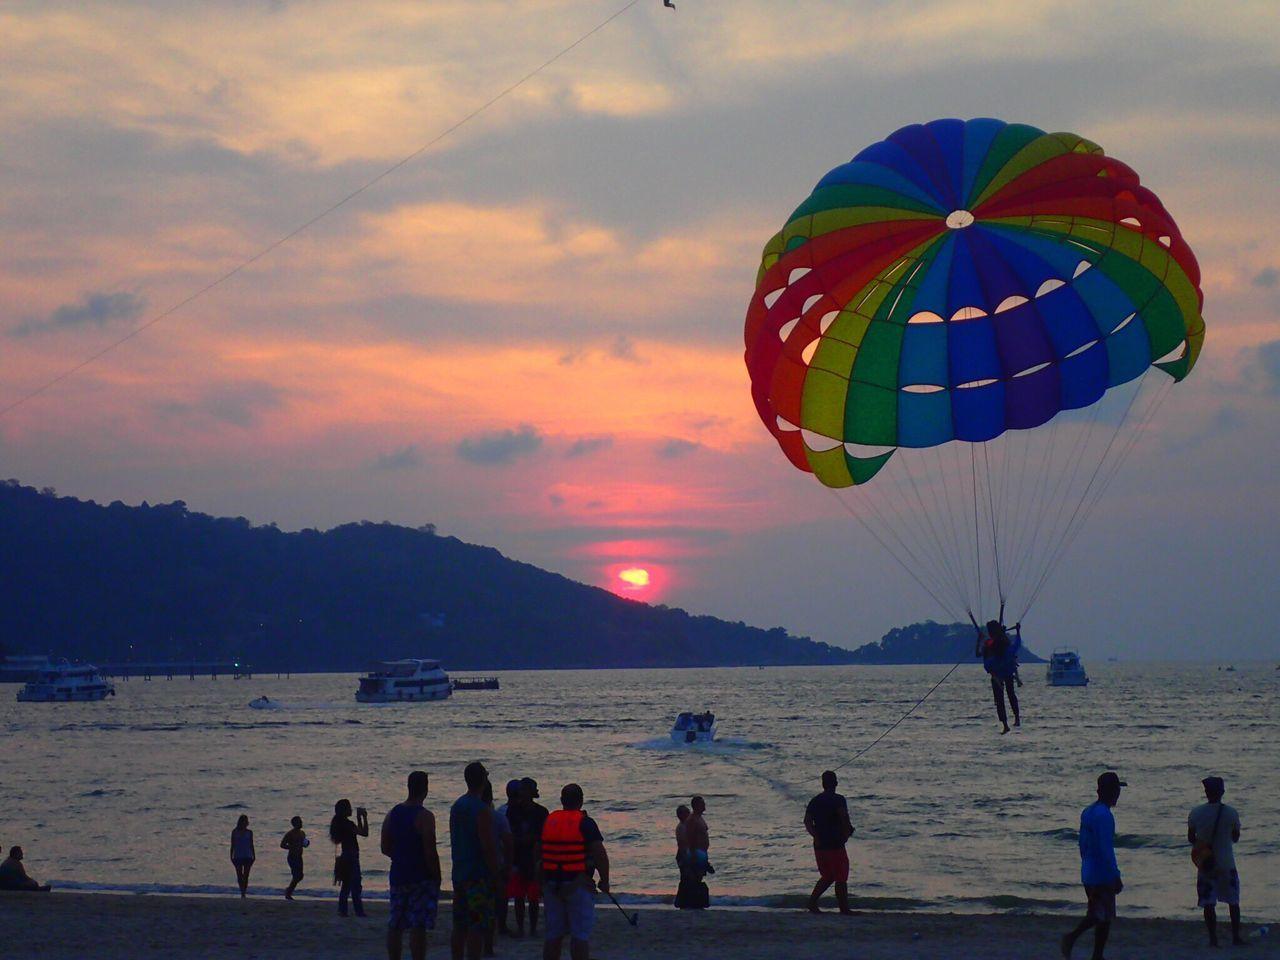 Phuket Patong Beach Parachute Sunset